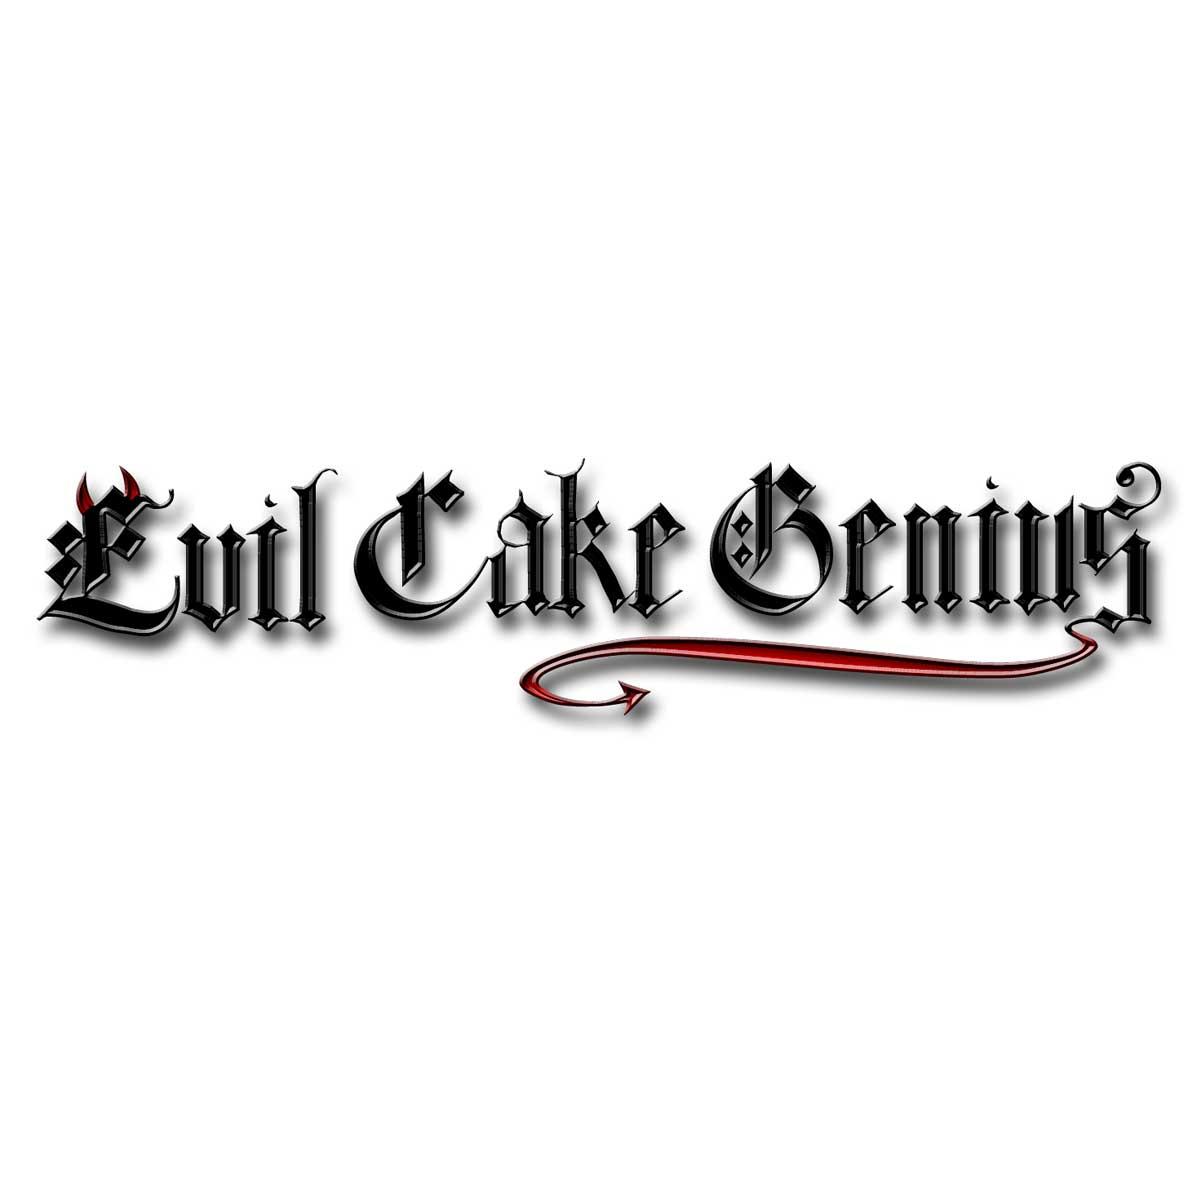 d3871632c0714 3D Stiletto High Heel Shoe Mold - Evil Cake Genius